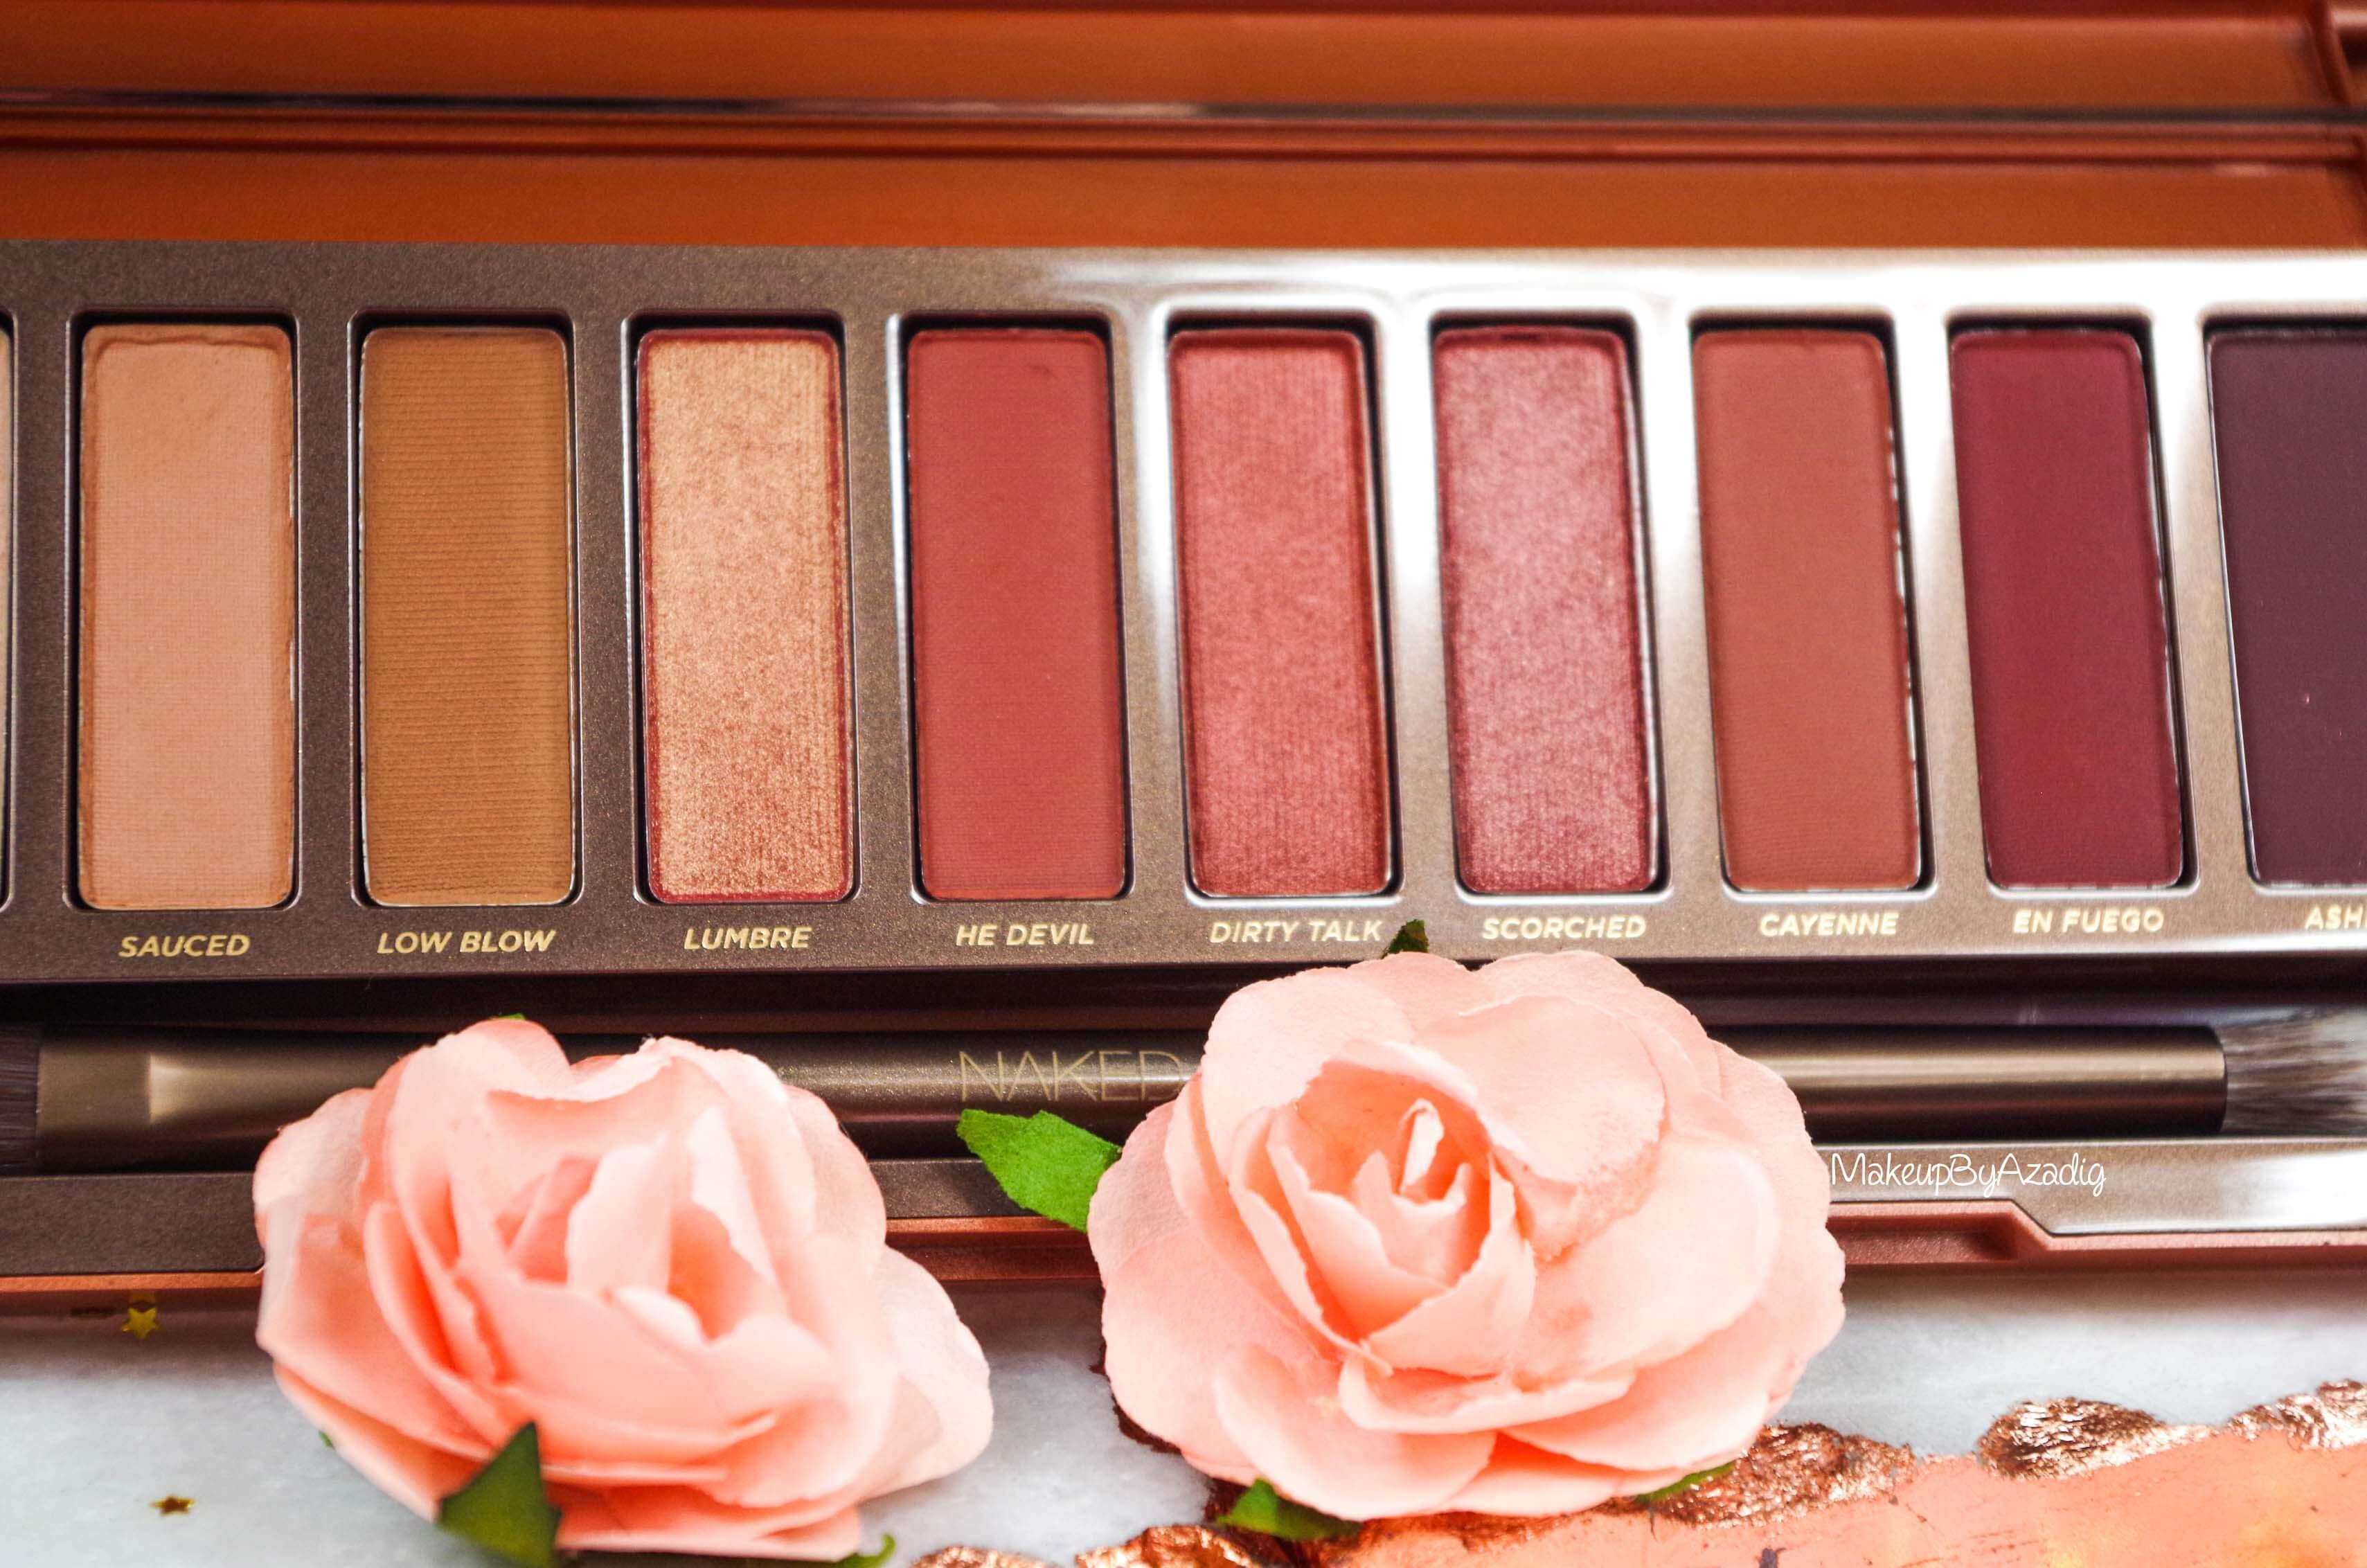 revue-review-nouvelle-palette-naked-heat-urban-decay-sephora-avis-prix-france-makeupbyazadig-swatch-colors